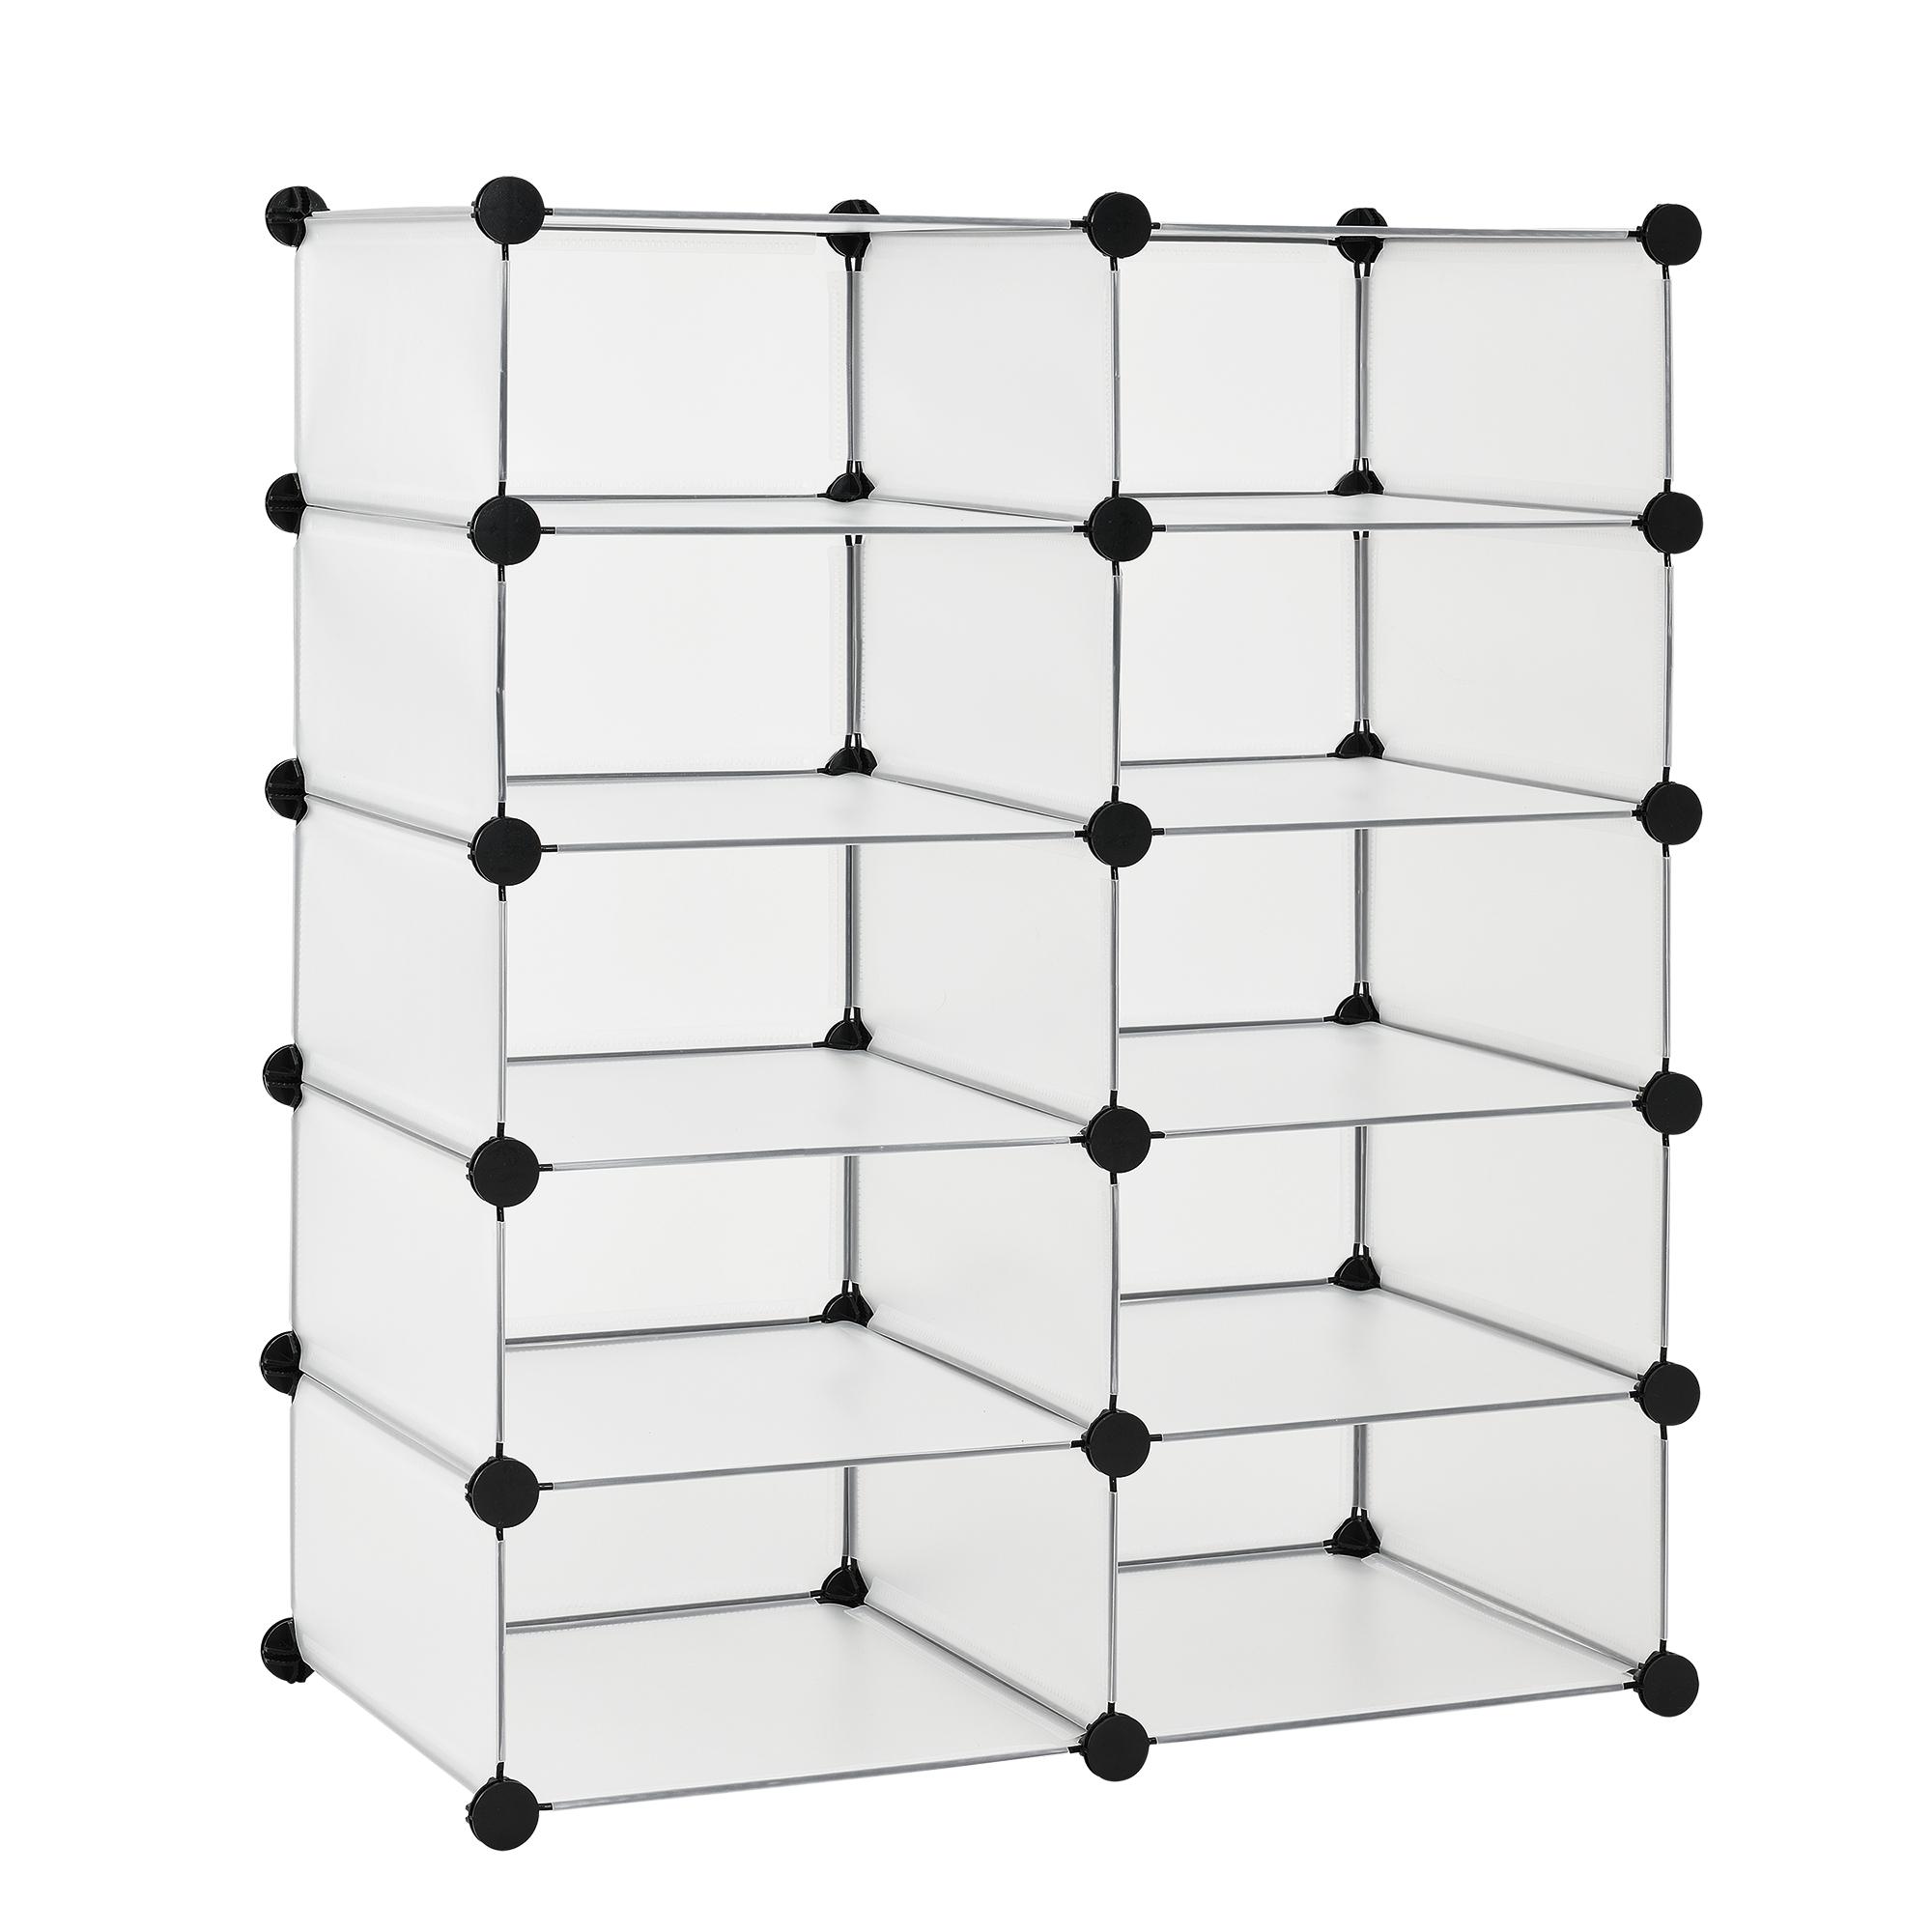 kleiderschrank stecksystem my blog. Black Bedroom Furniture Sets. Home Design Ideas